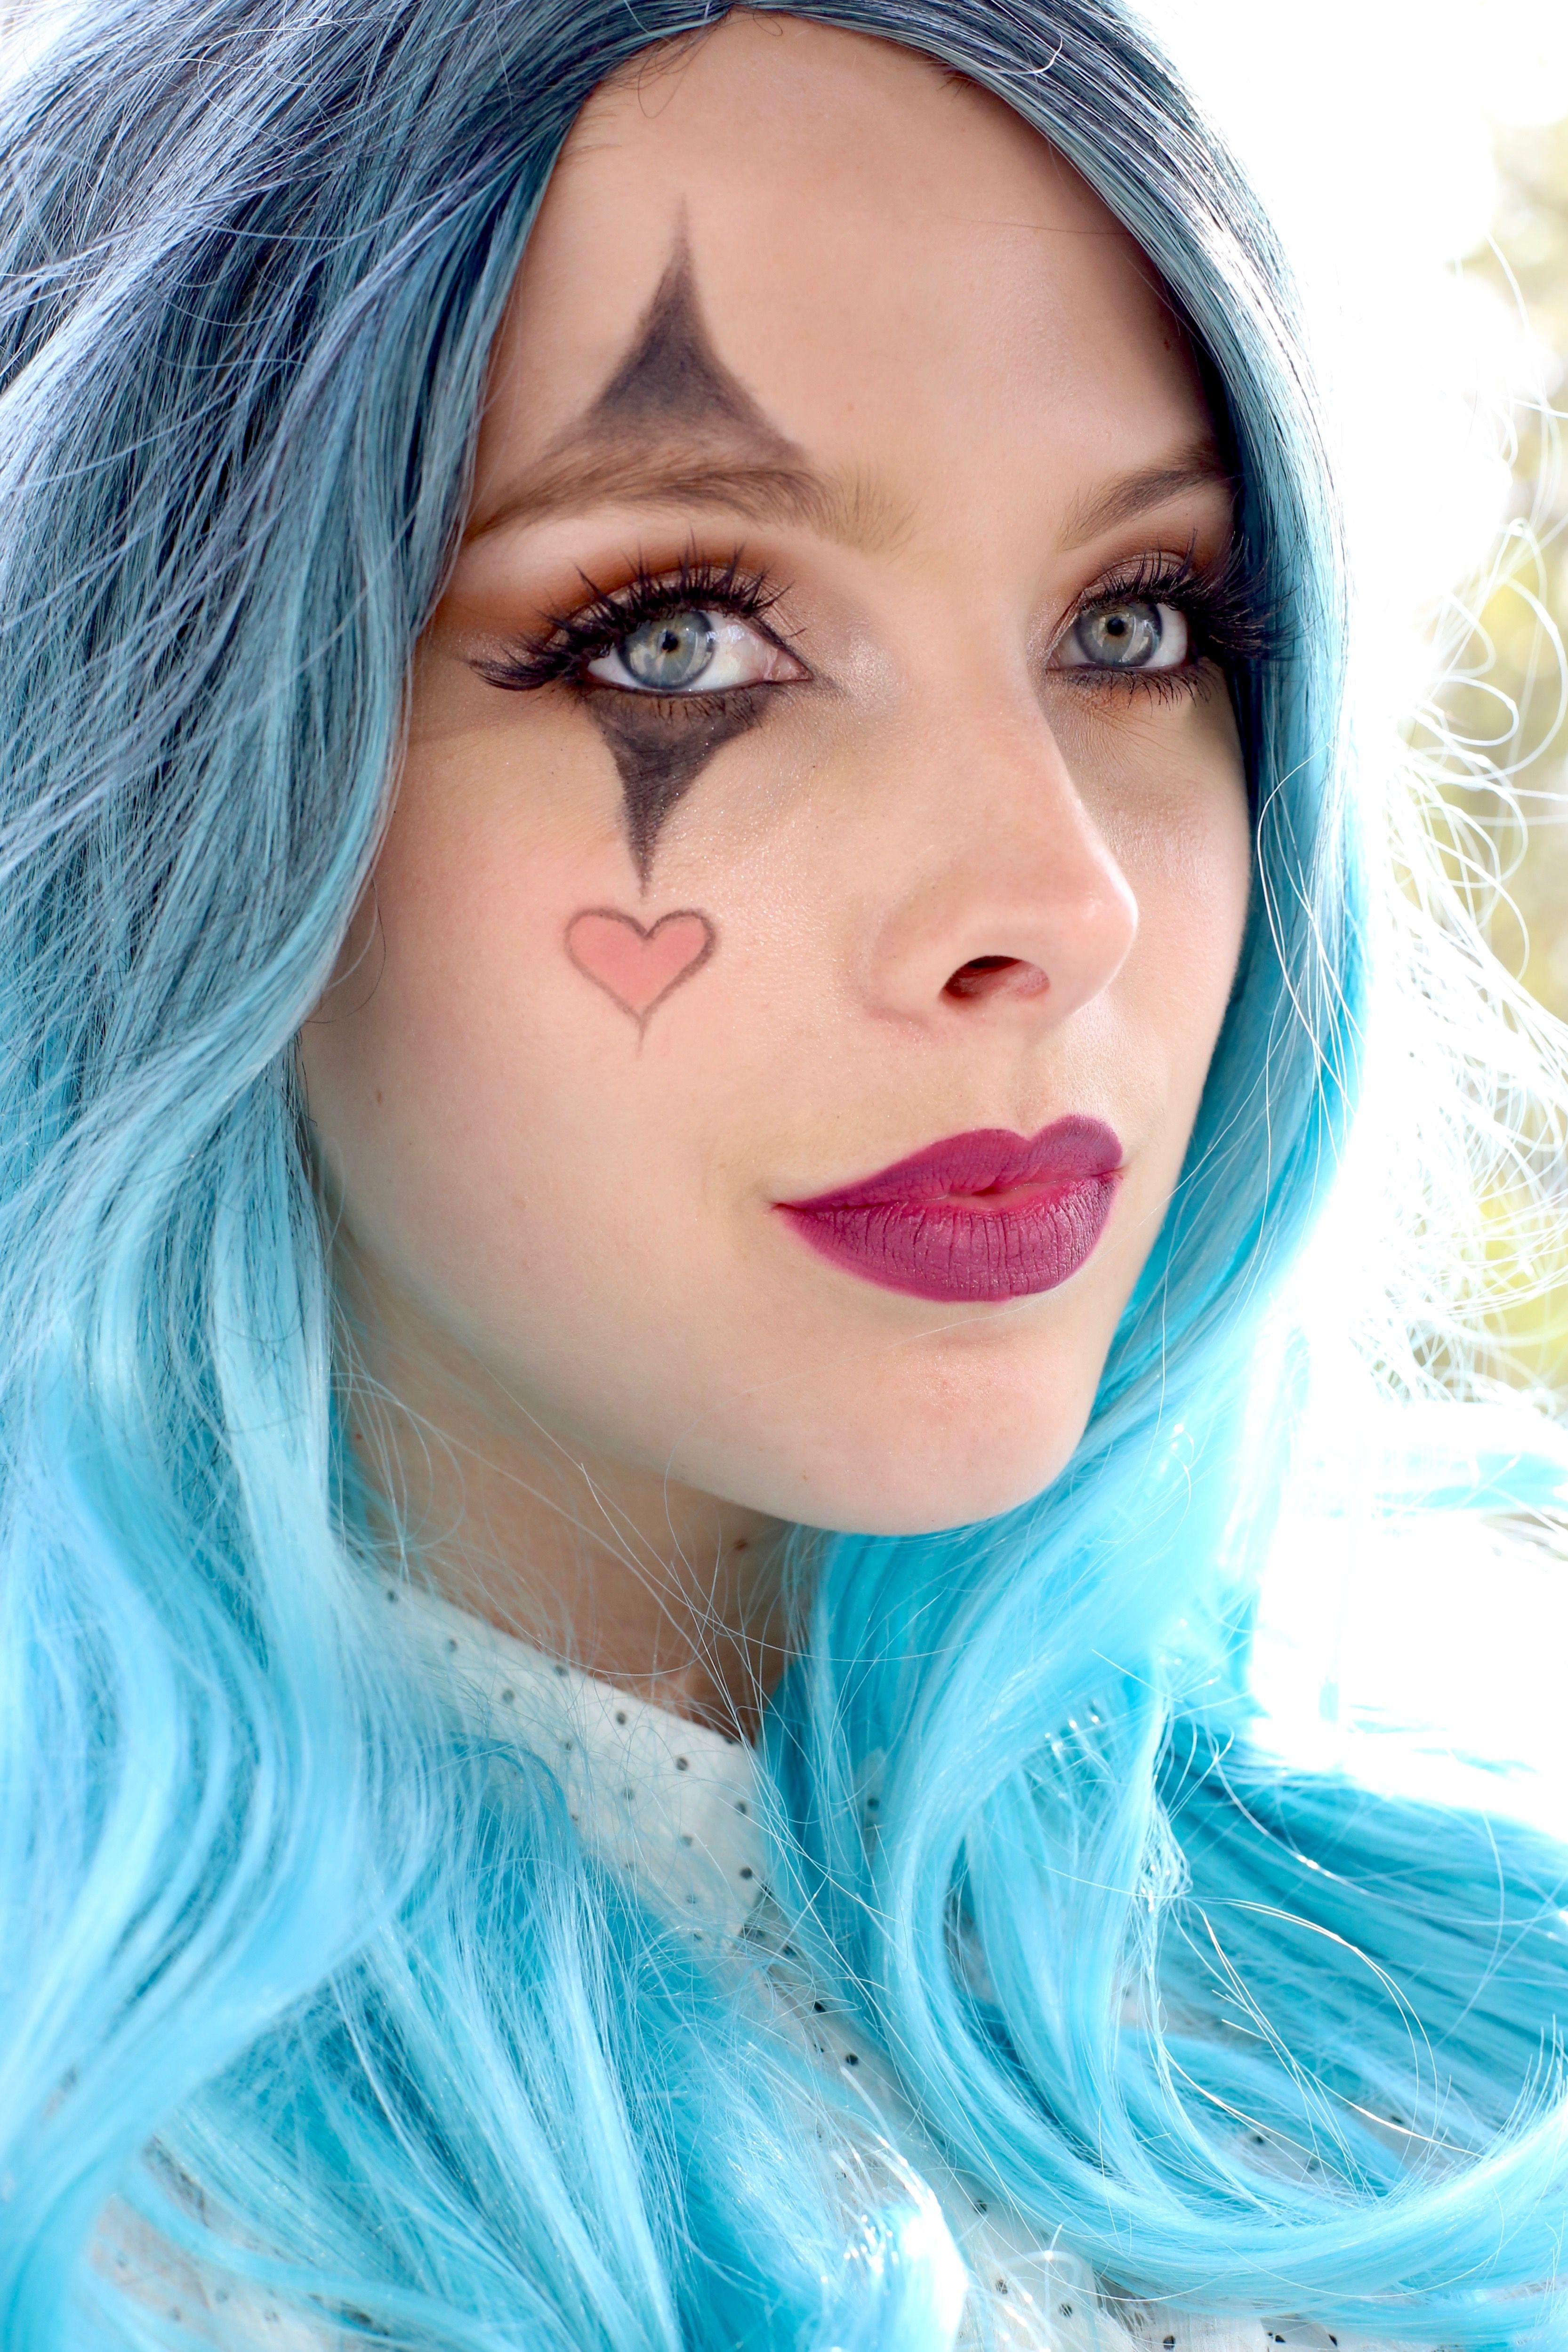 Halloween Costume idea - Glam Clown Makeup - easy ...